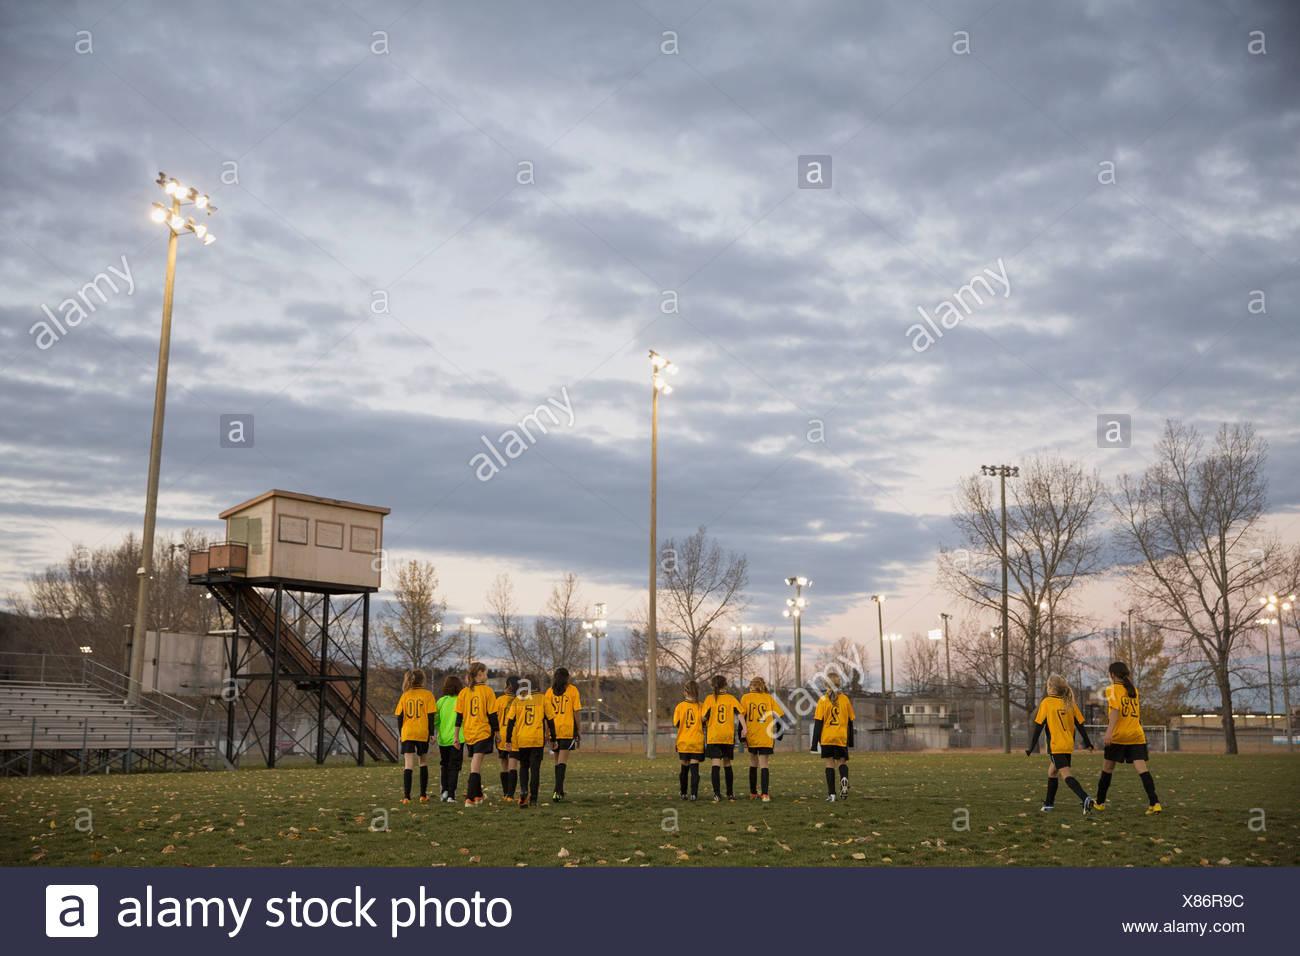 Soccer team walking on field - Stock Image